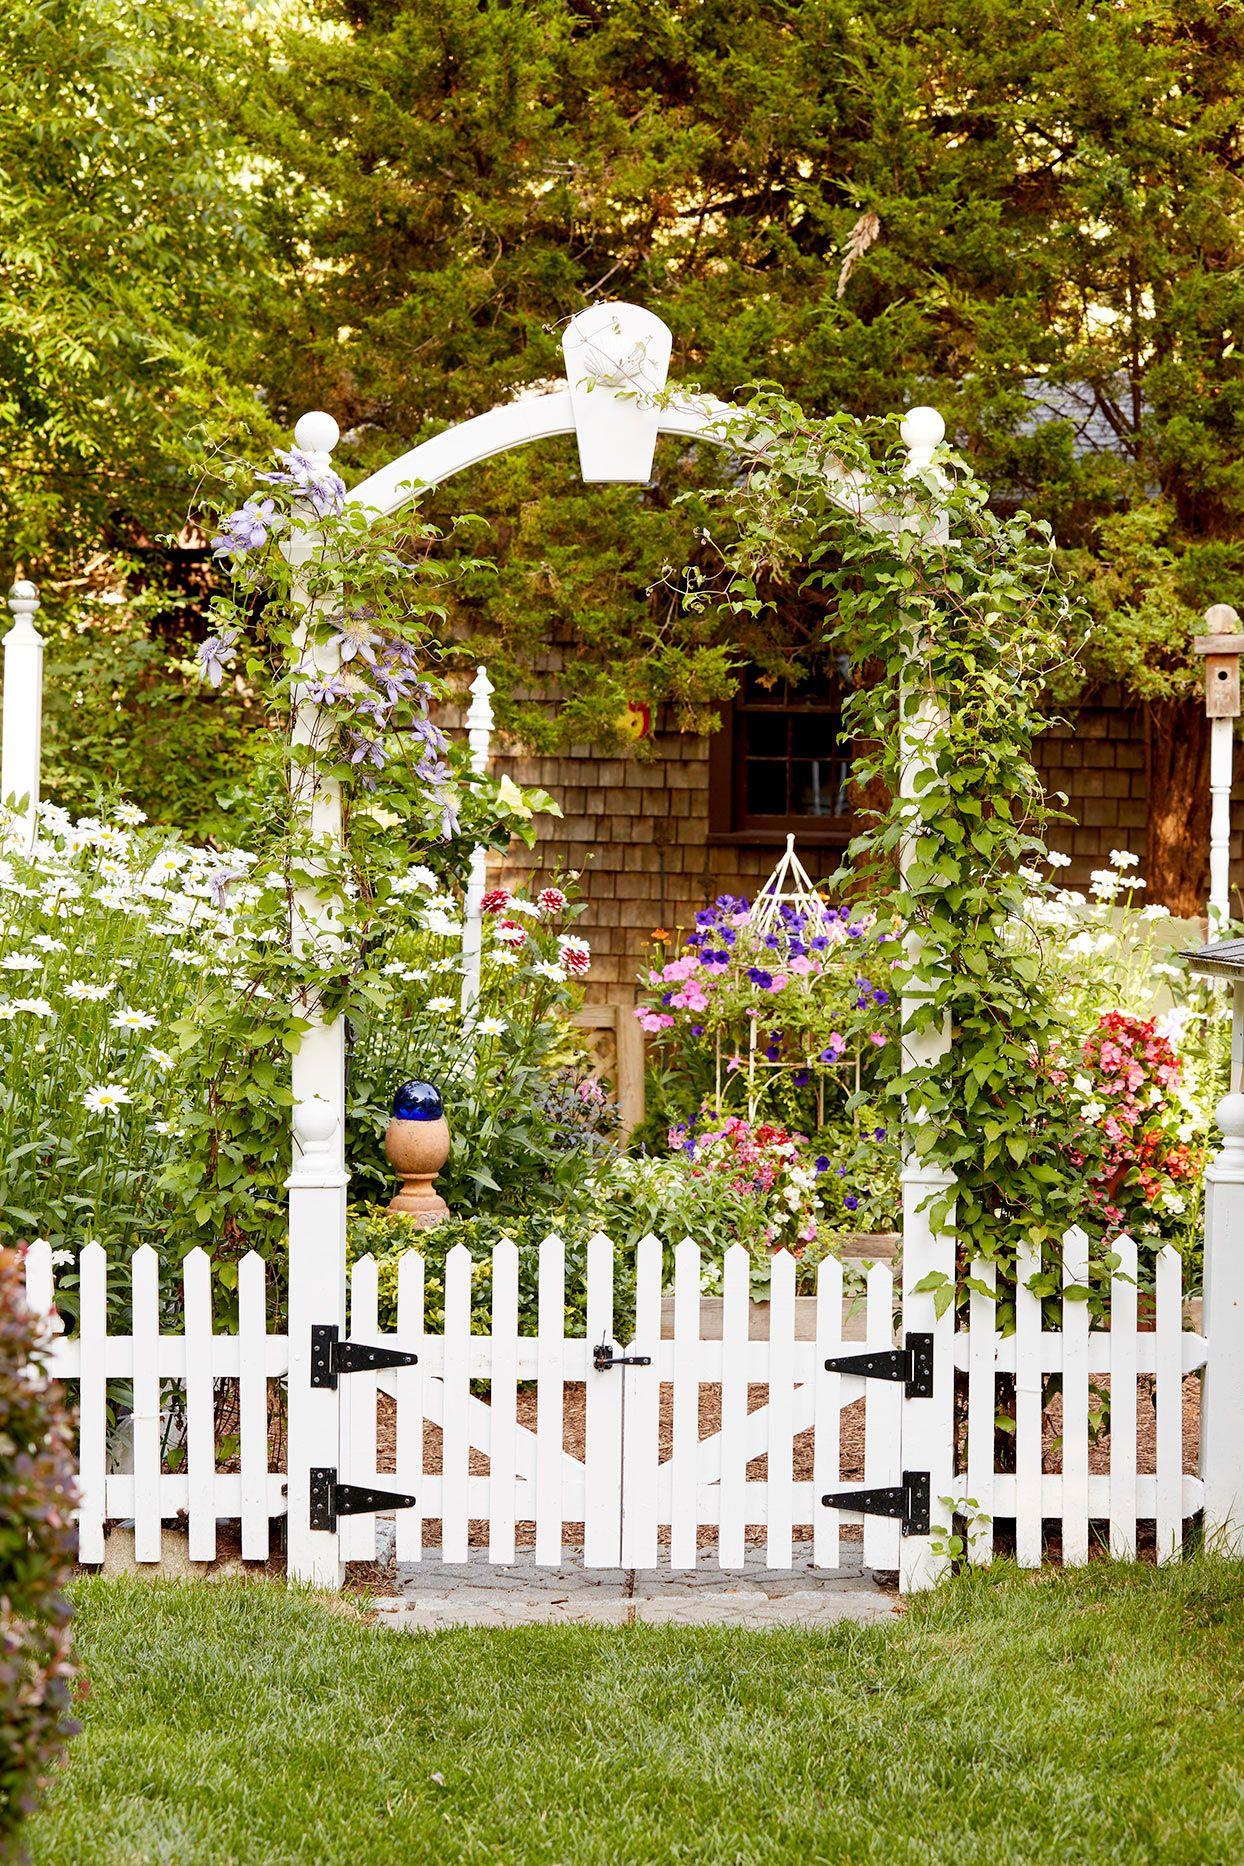 Add Style To Your Yard With These Favorite Fence Ideas Wooden Garden Gate Cottage Garden Design Diy Garden Fence